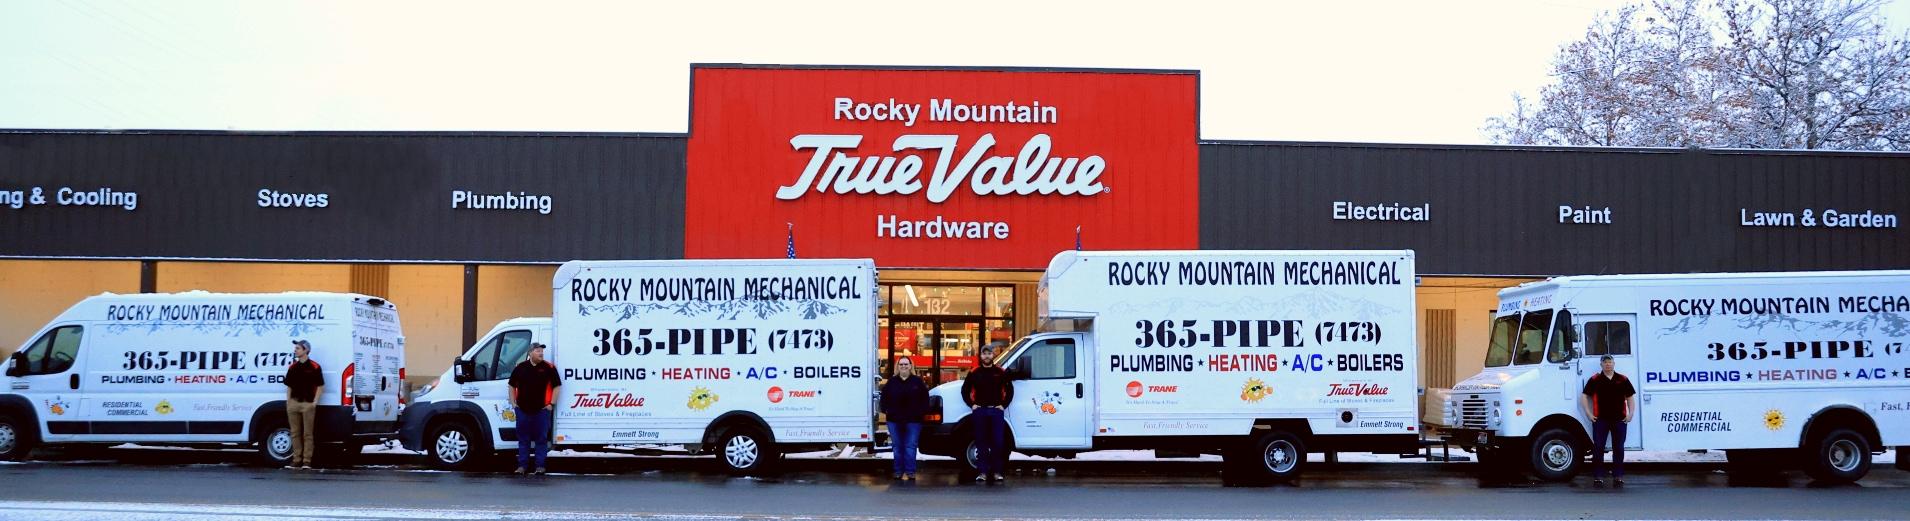 Rocky Mountain Team.